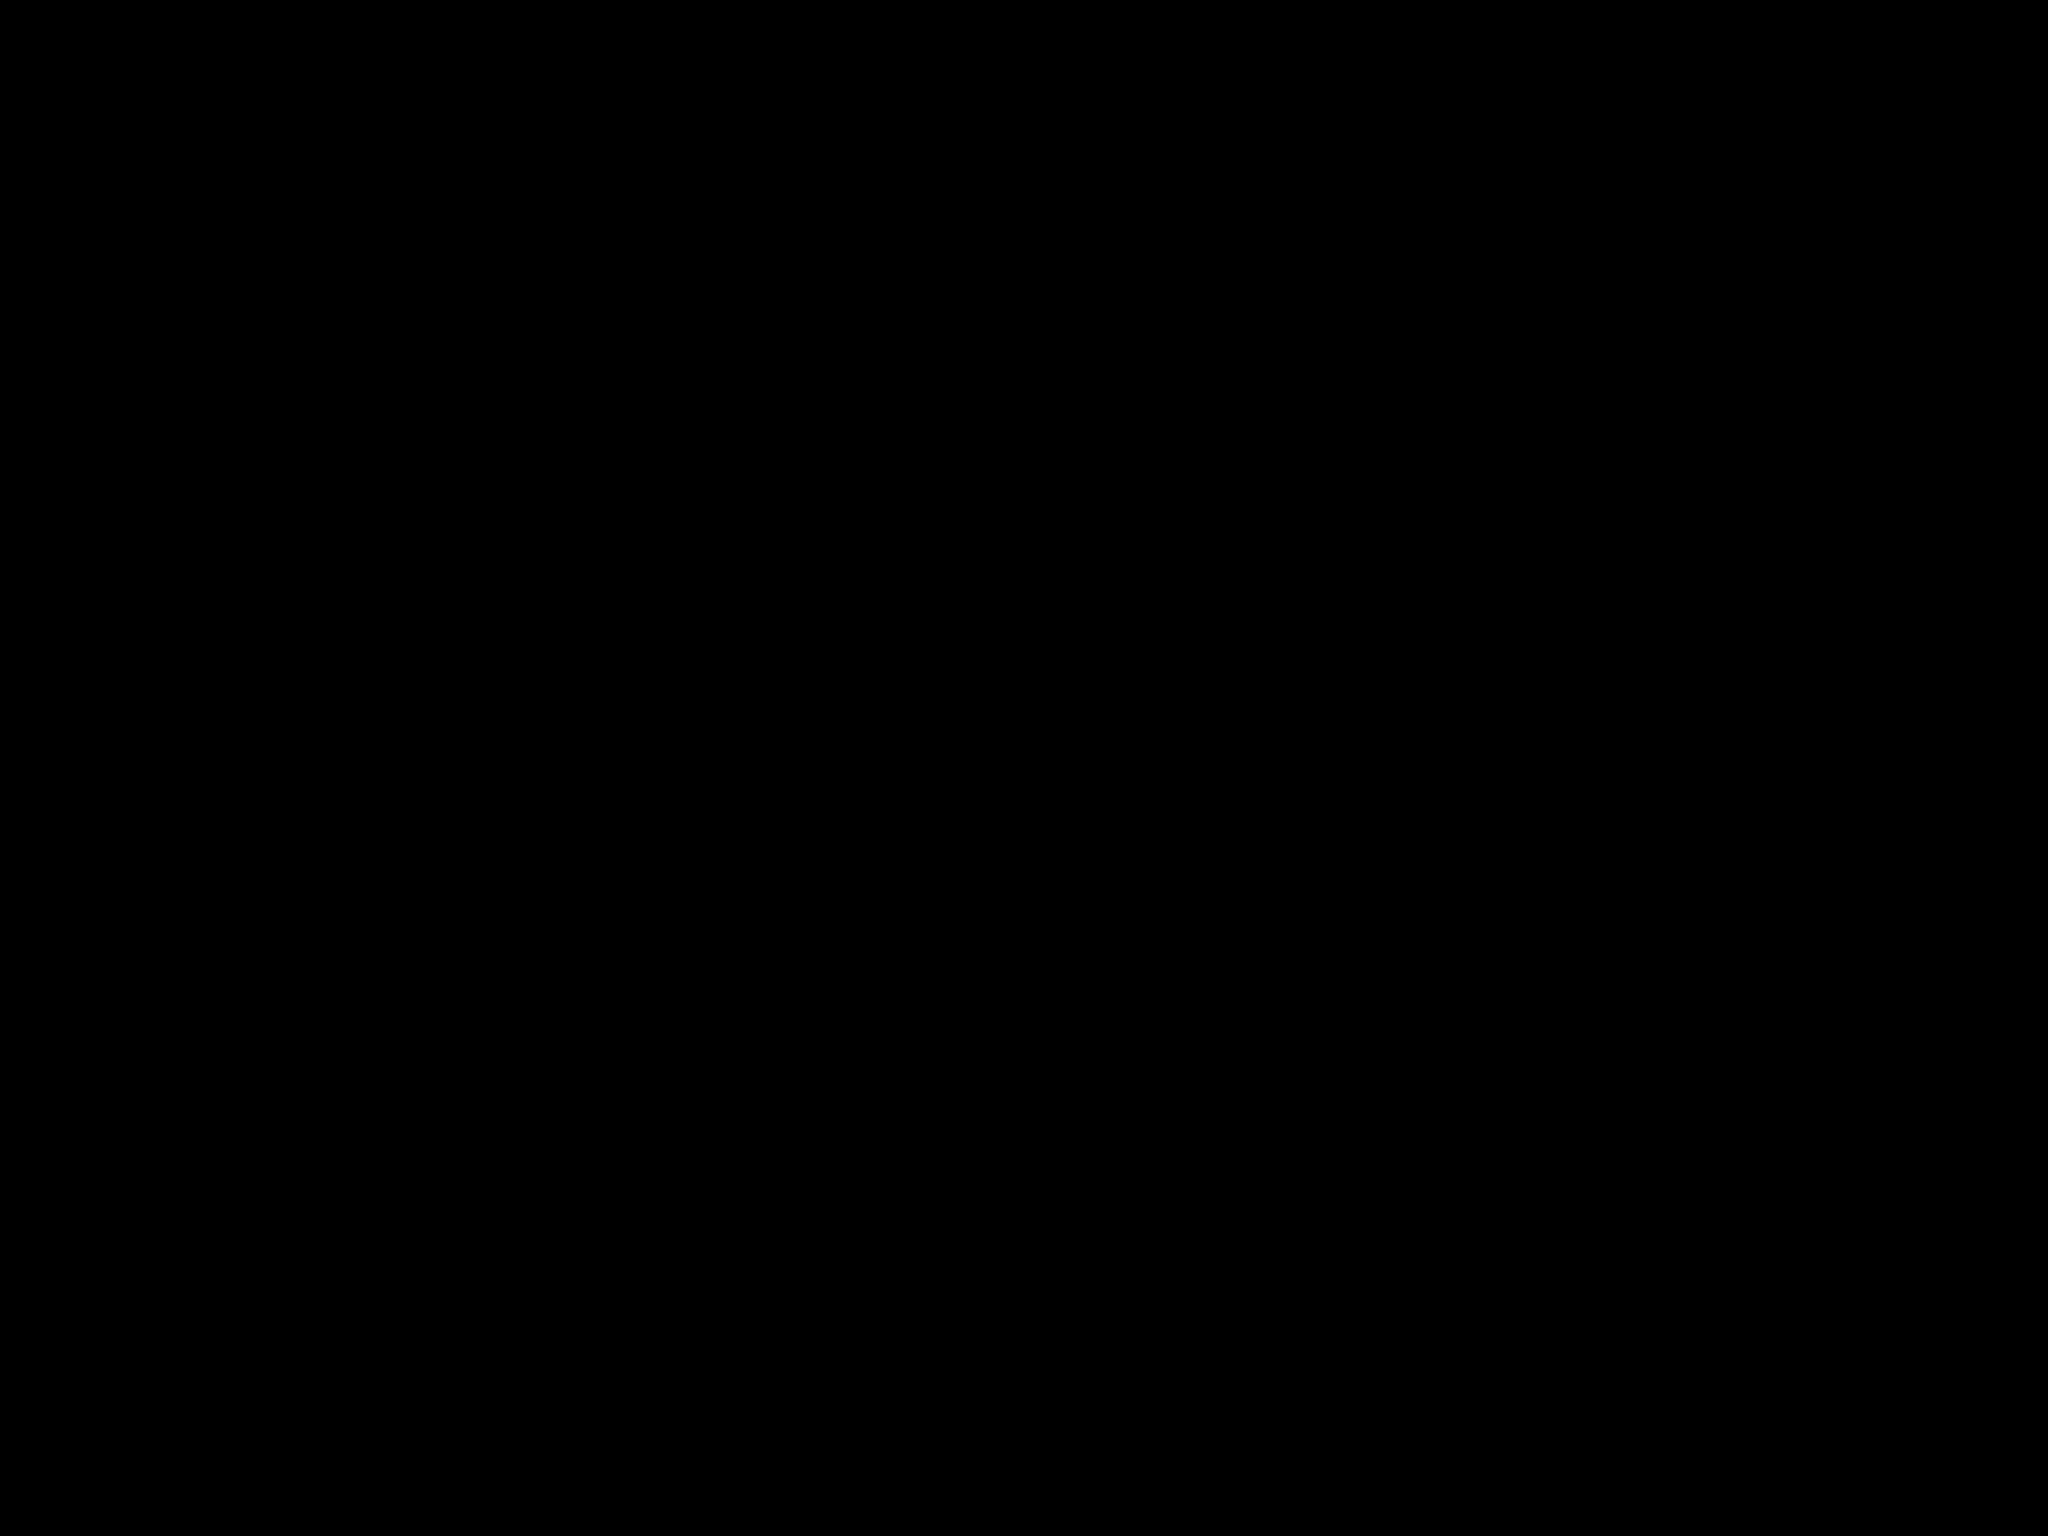 SAMTAK logo